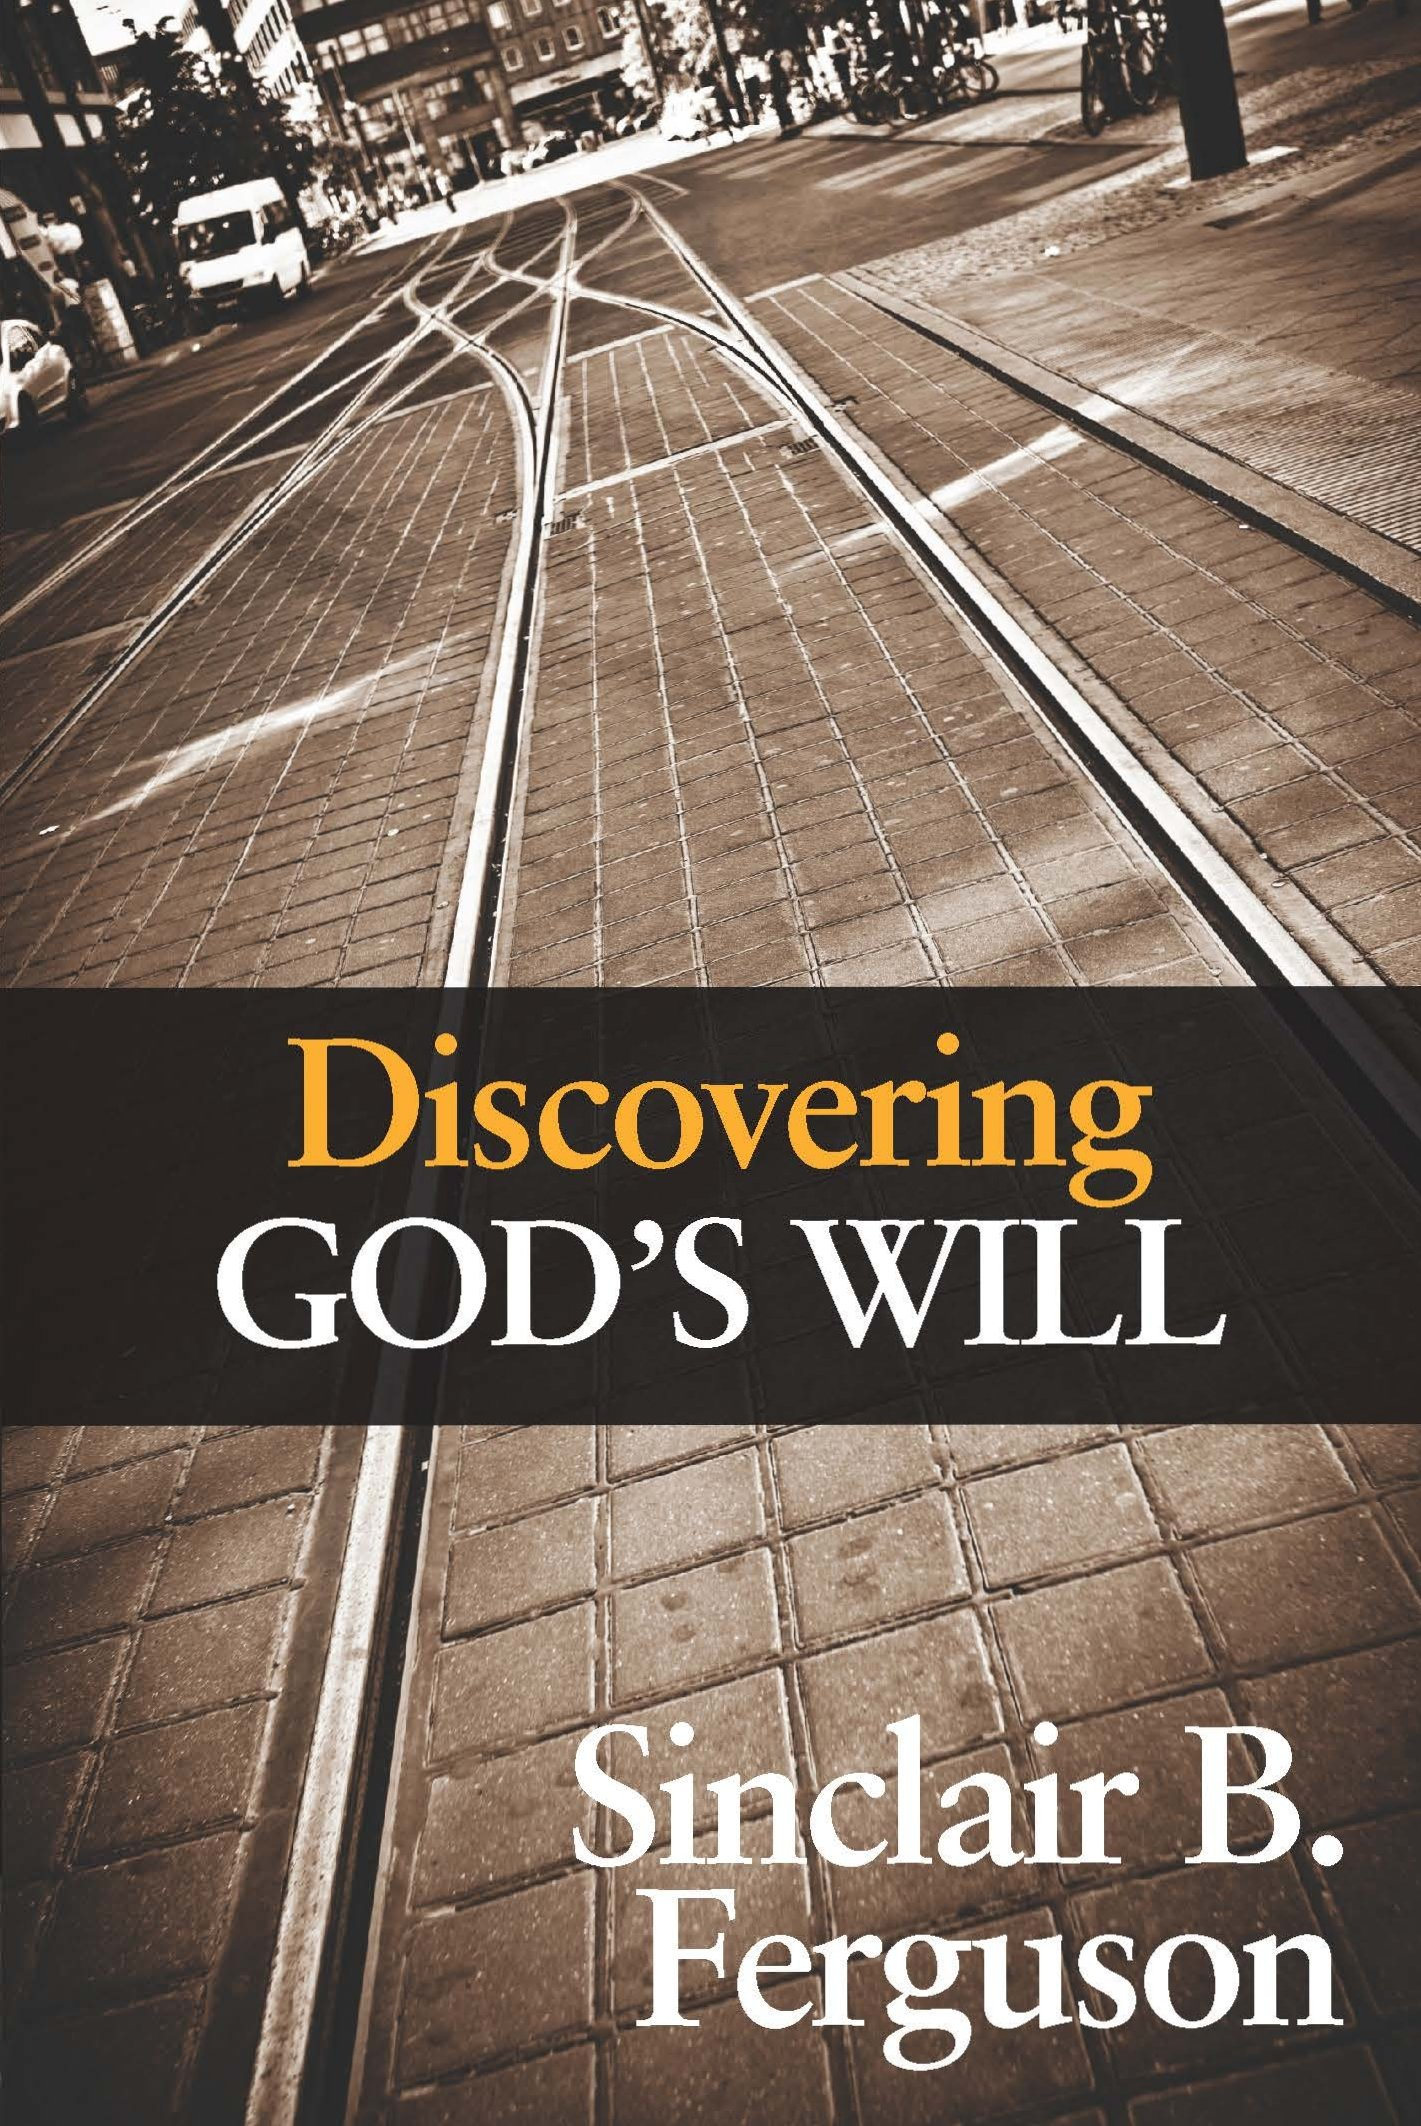 Discovering God\'s Will: Sinclair Ferguson: 9781848712638: Amazon.com ...